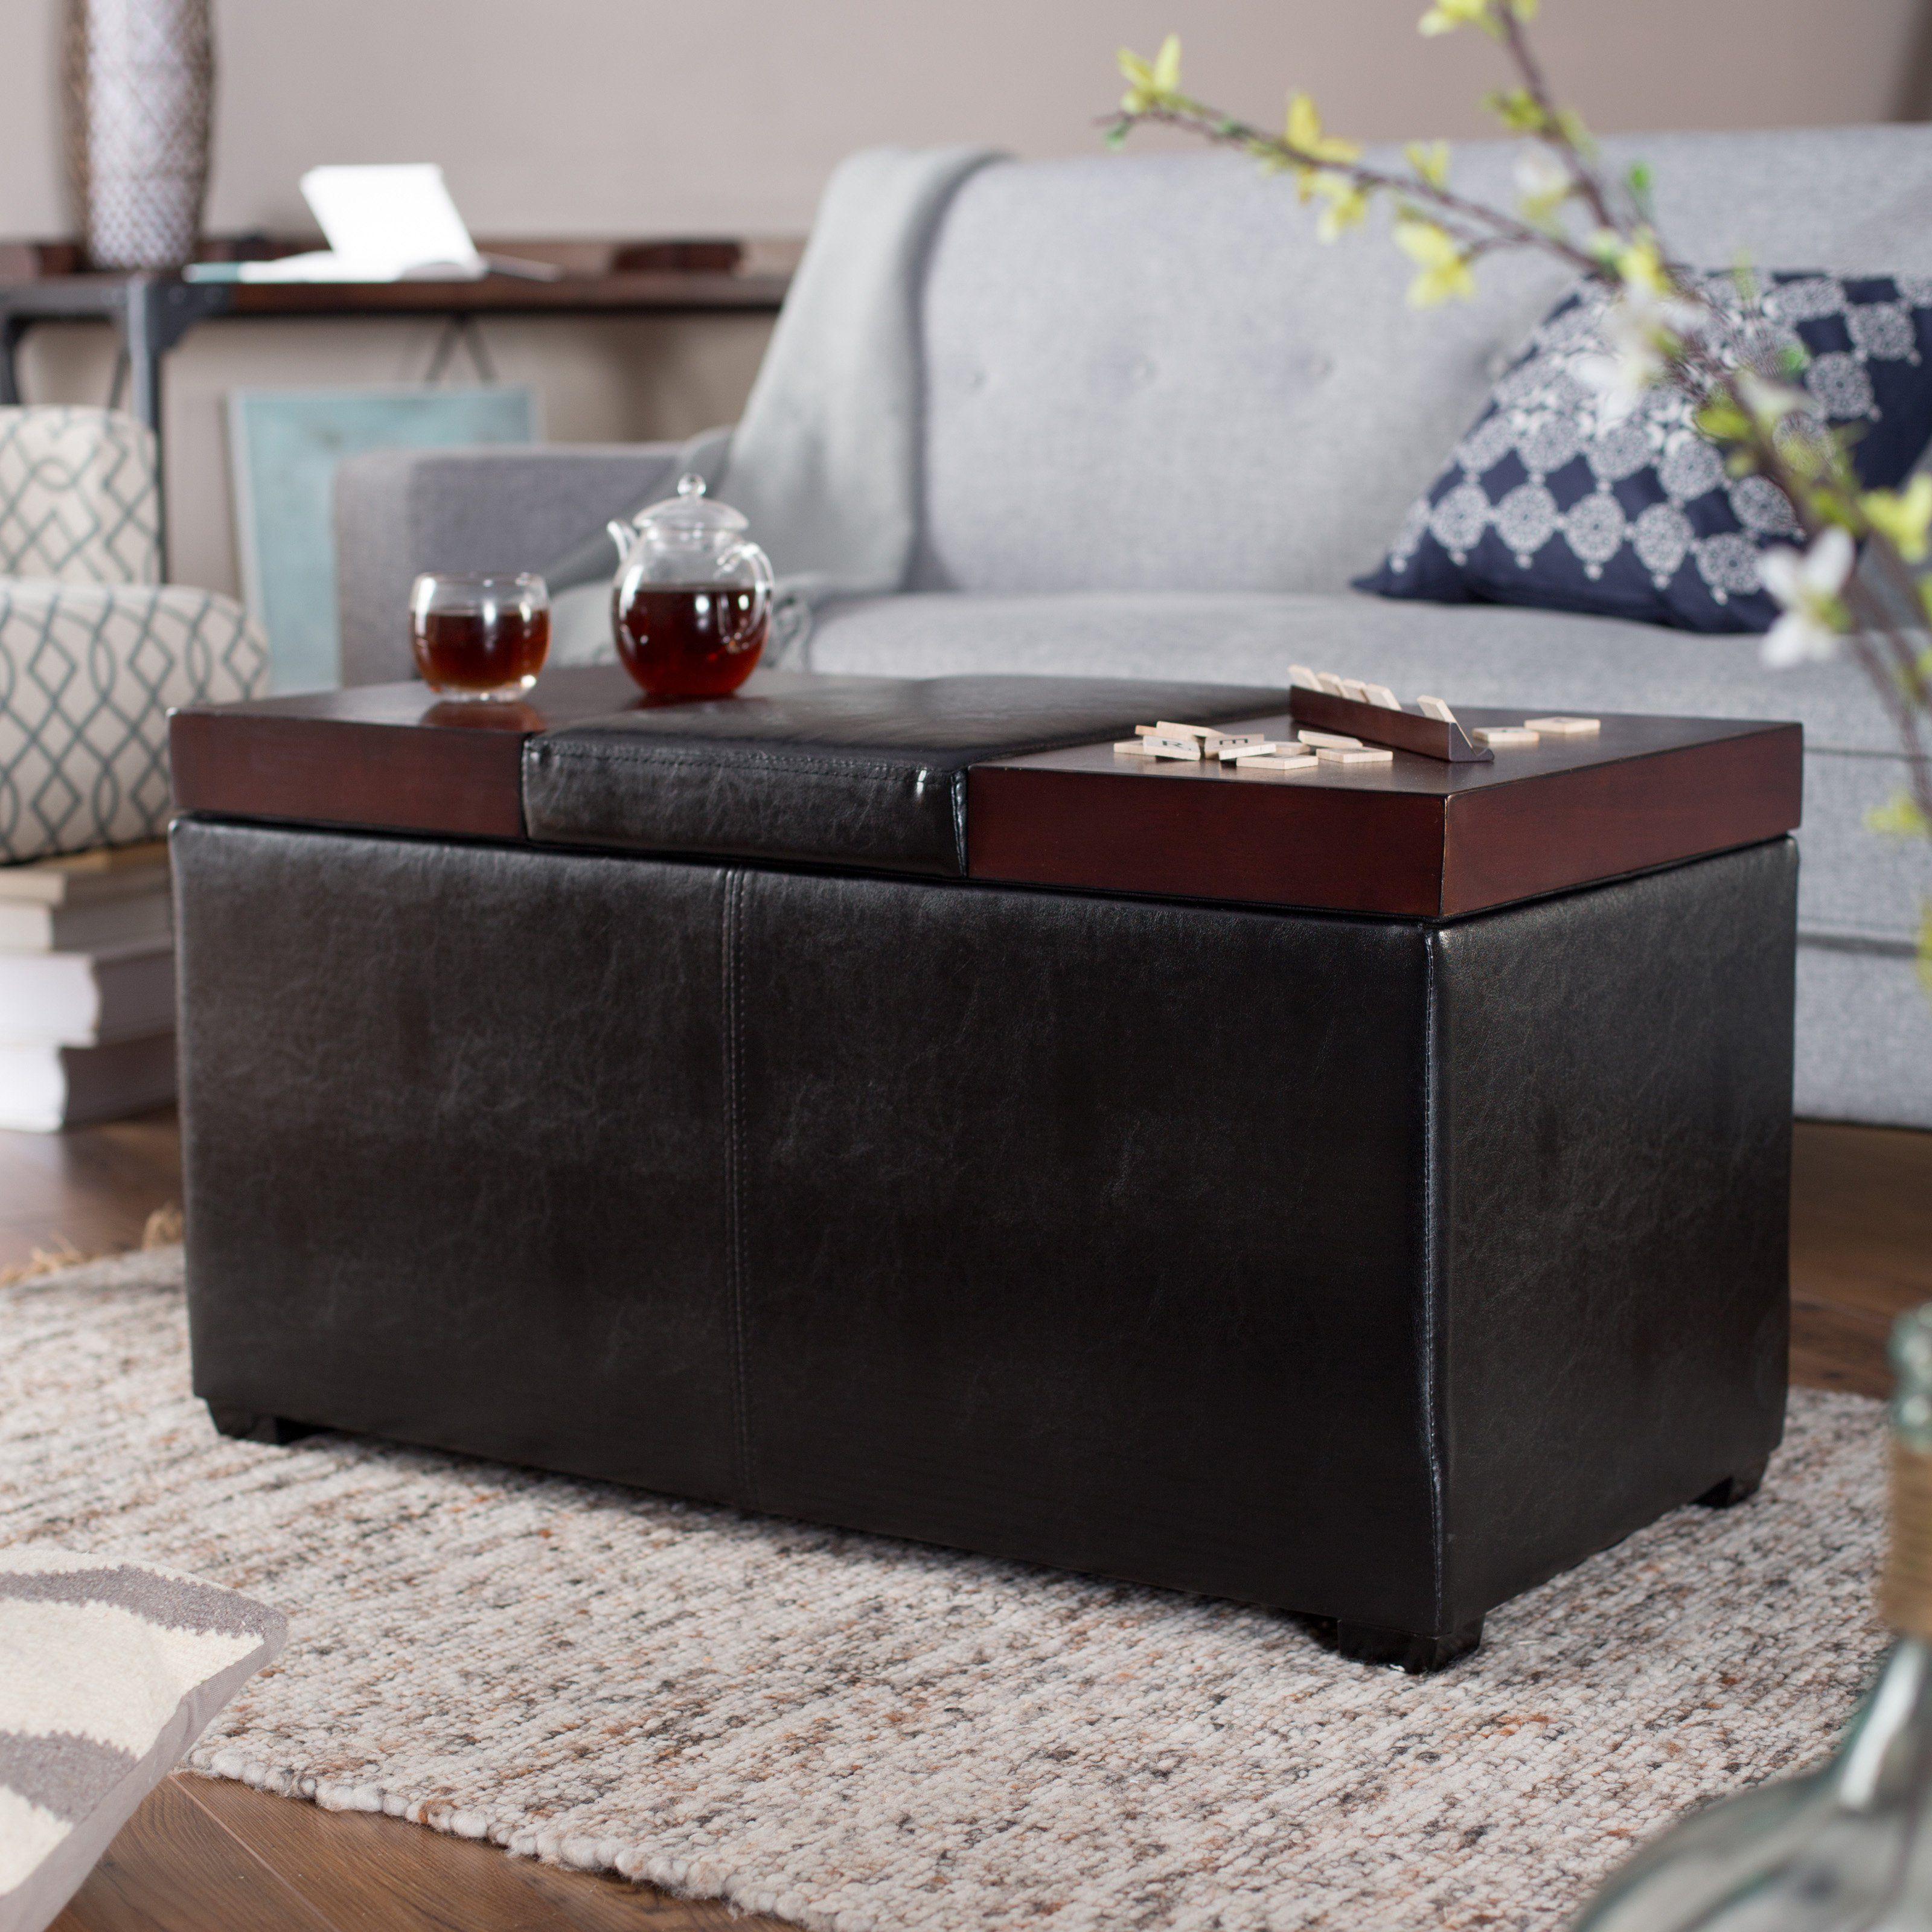 Surprising Belham Living Madison Lift Top Upholstered Storage Ottoman Dailytribune Chair Design For Home Dailytribuneorg